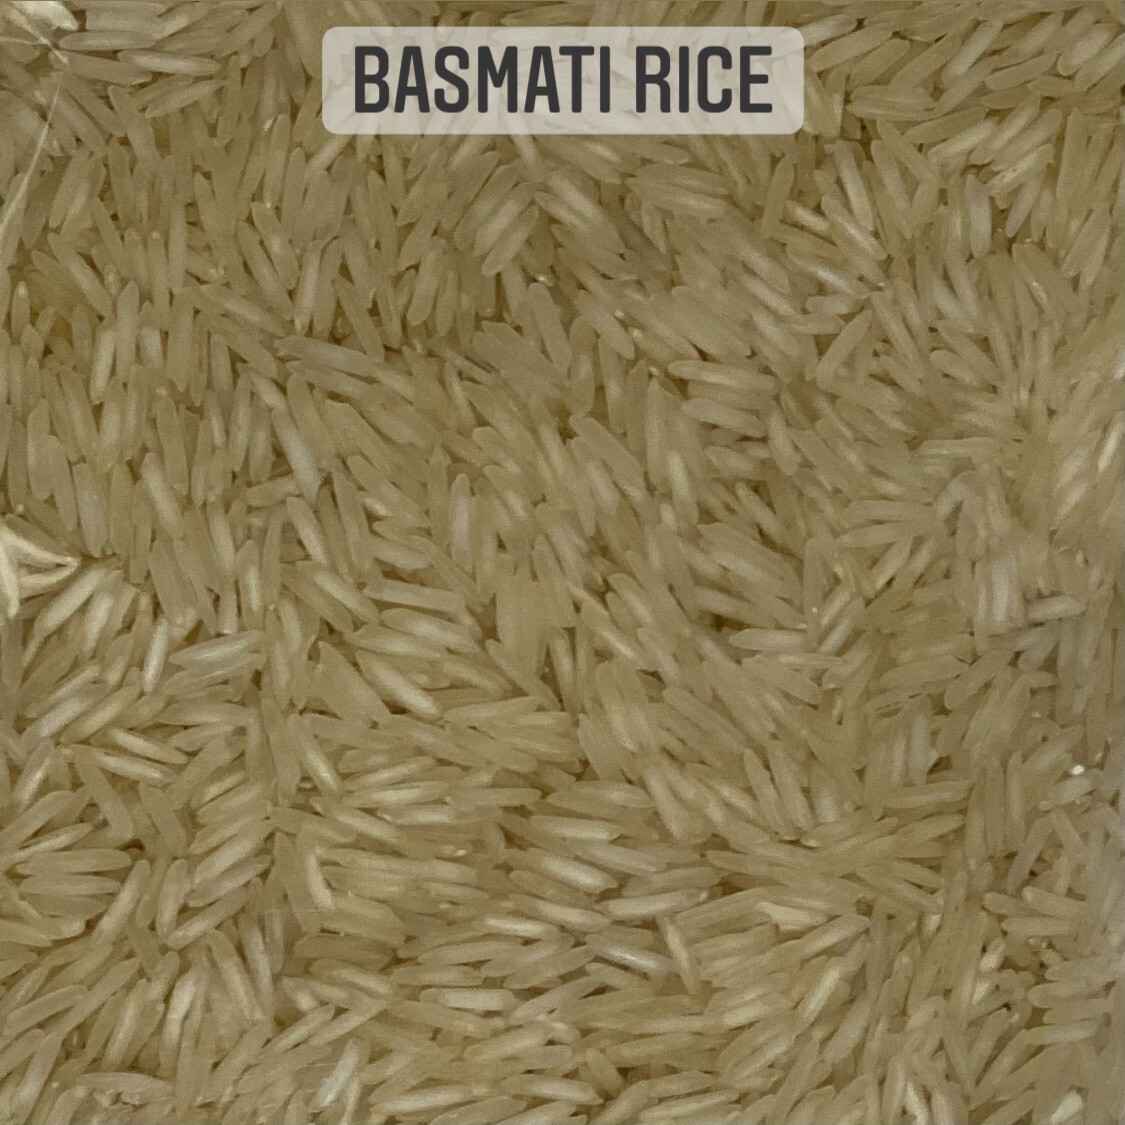 NEW - BASMATI RICE